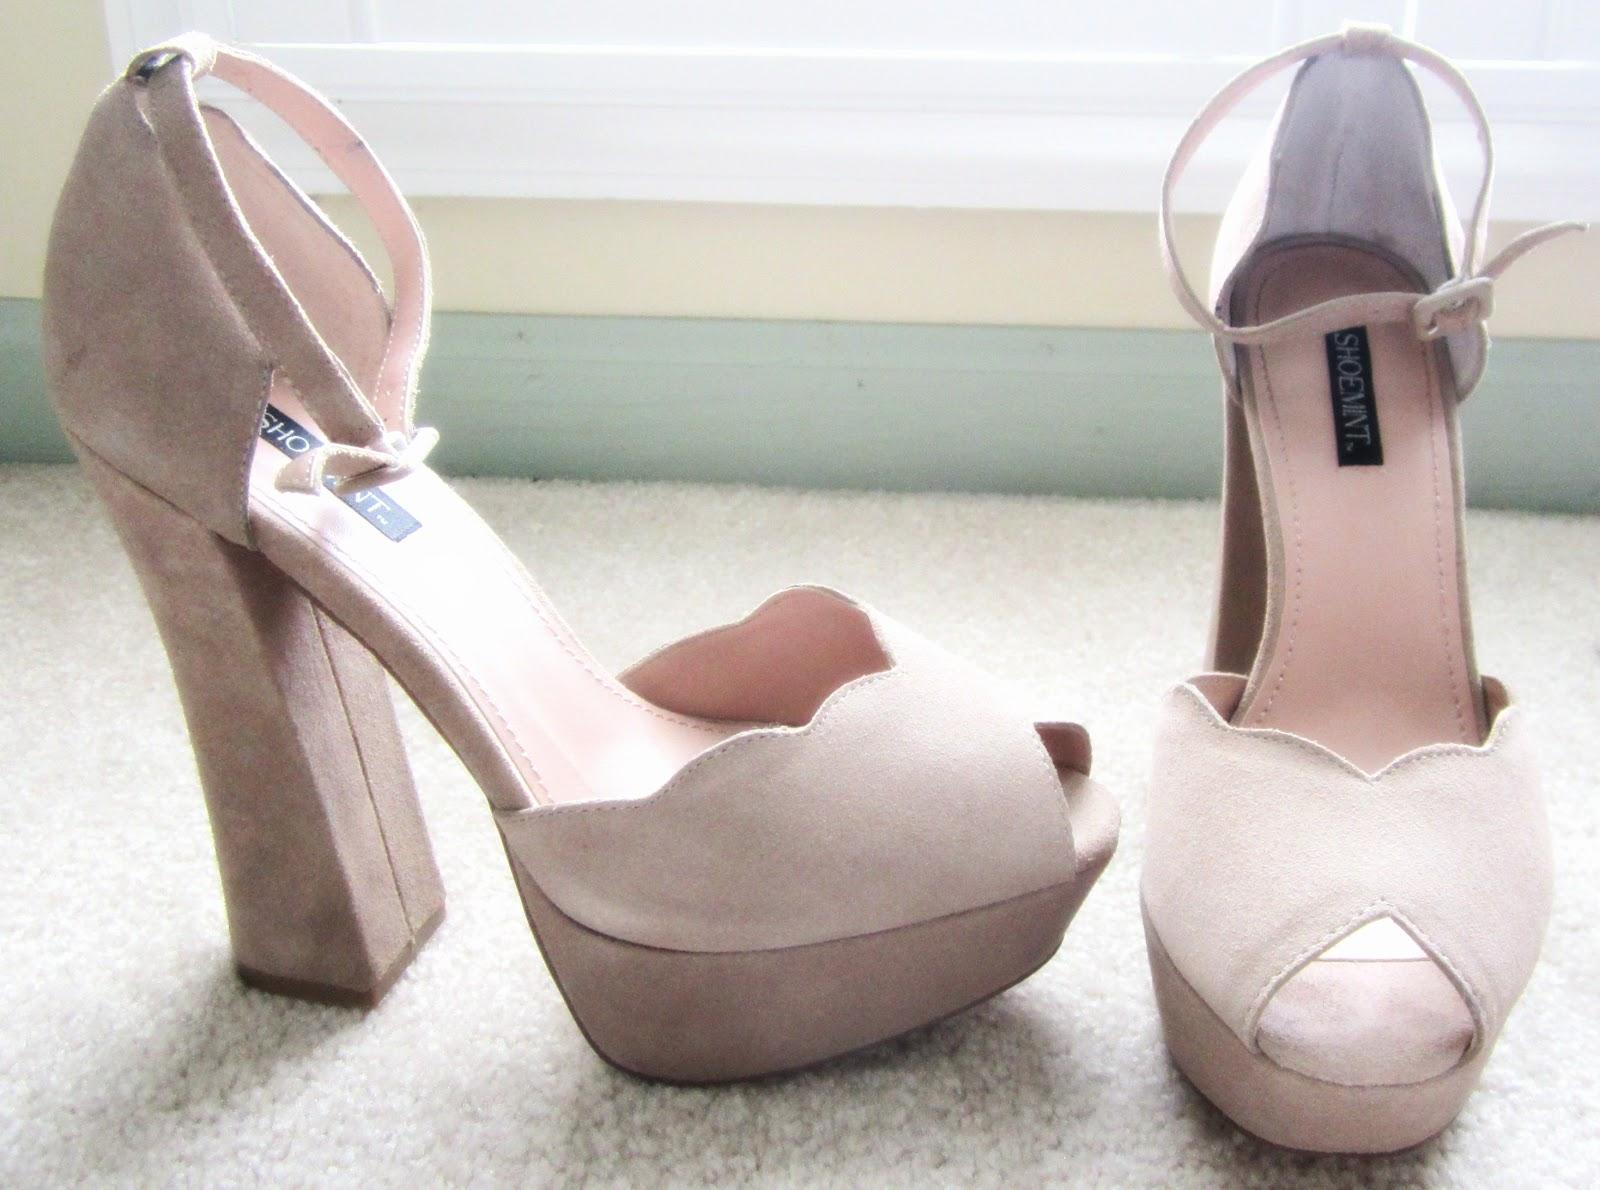 http://4.bp.blogspot.com/-V5KUFnXfH38/T5L7C4wyETI/AAAAAAAAC64/XEX2Qwpg7s0/s1600/tan%2Bshoes.jpg